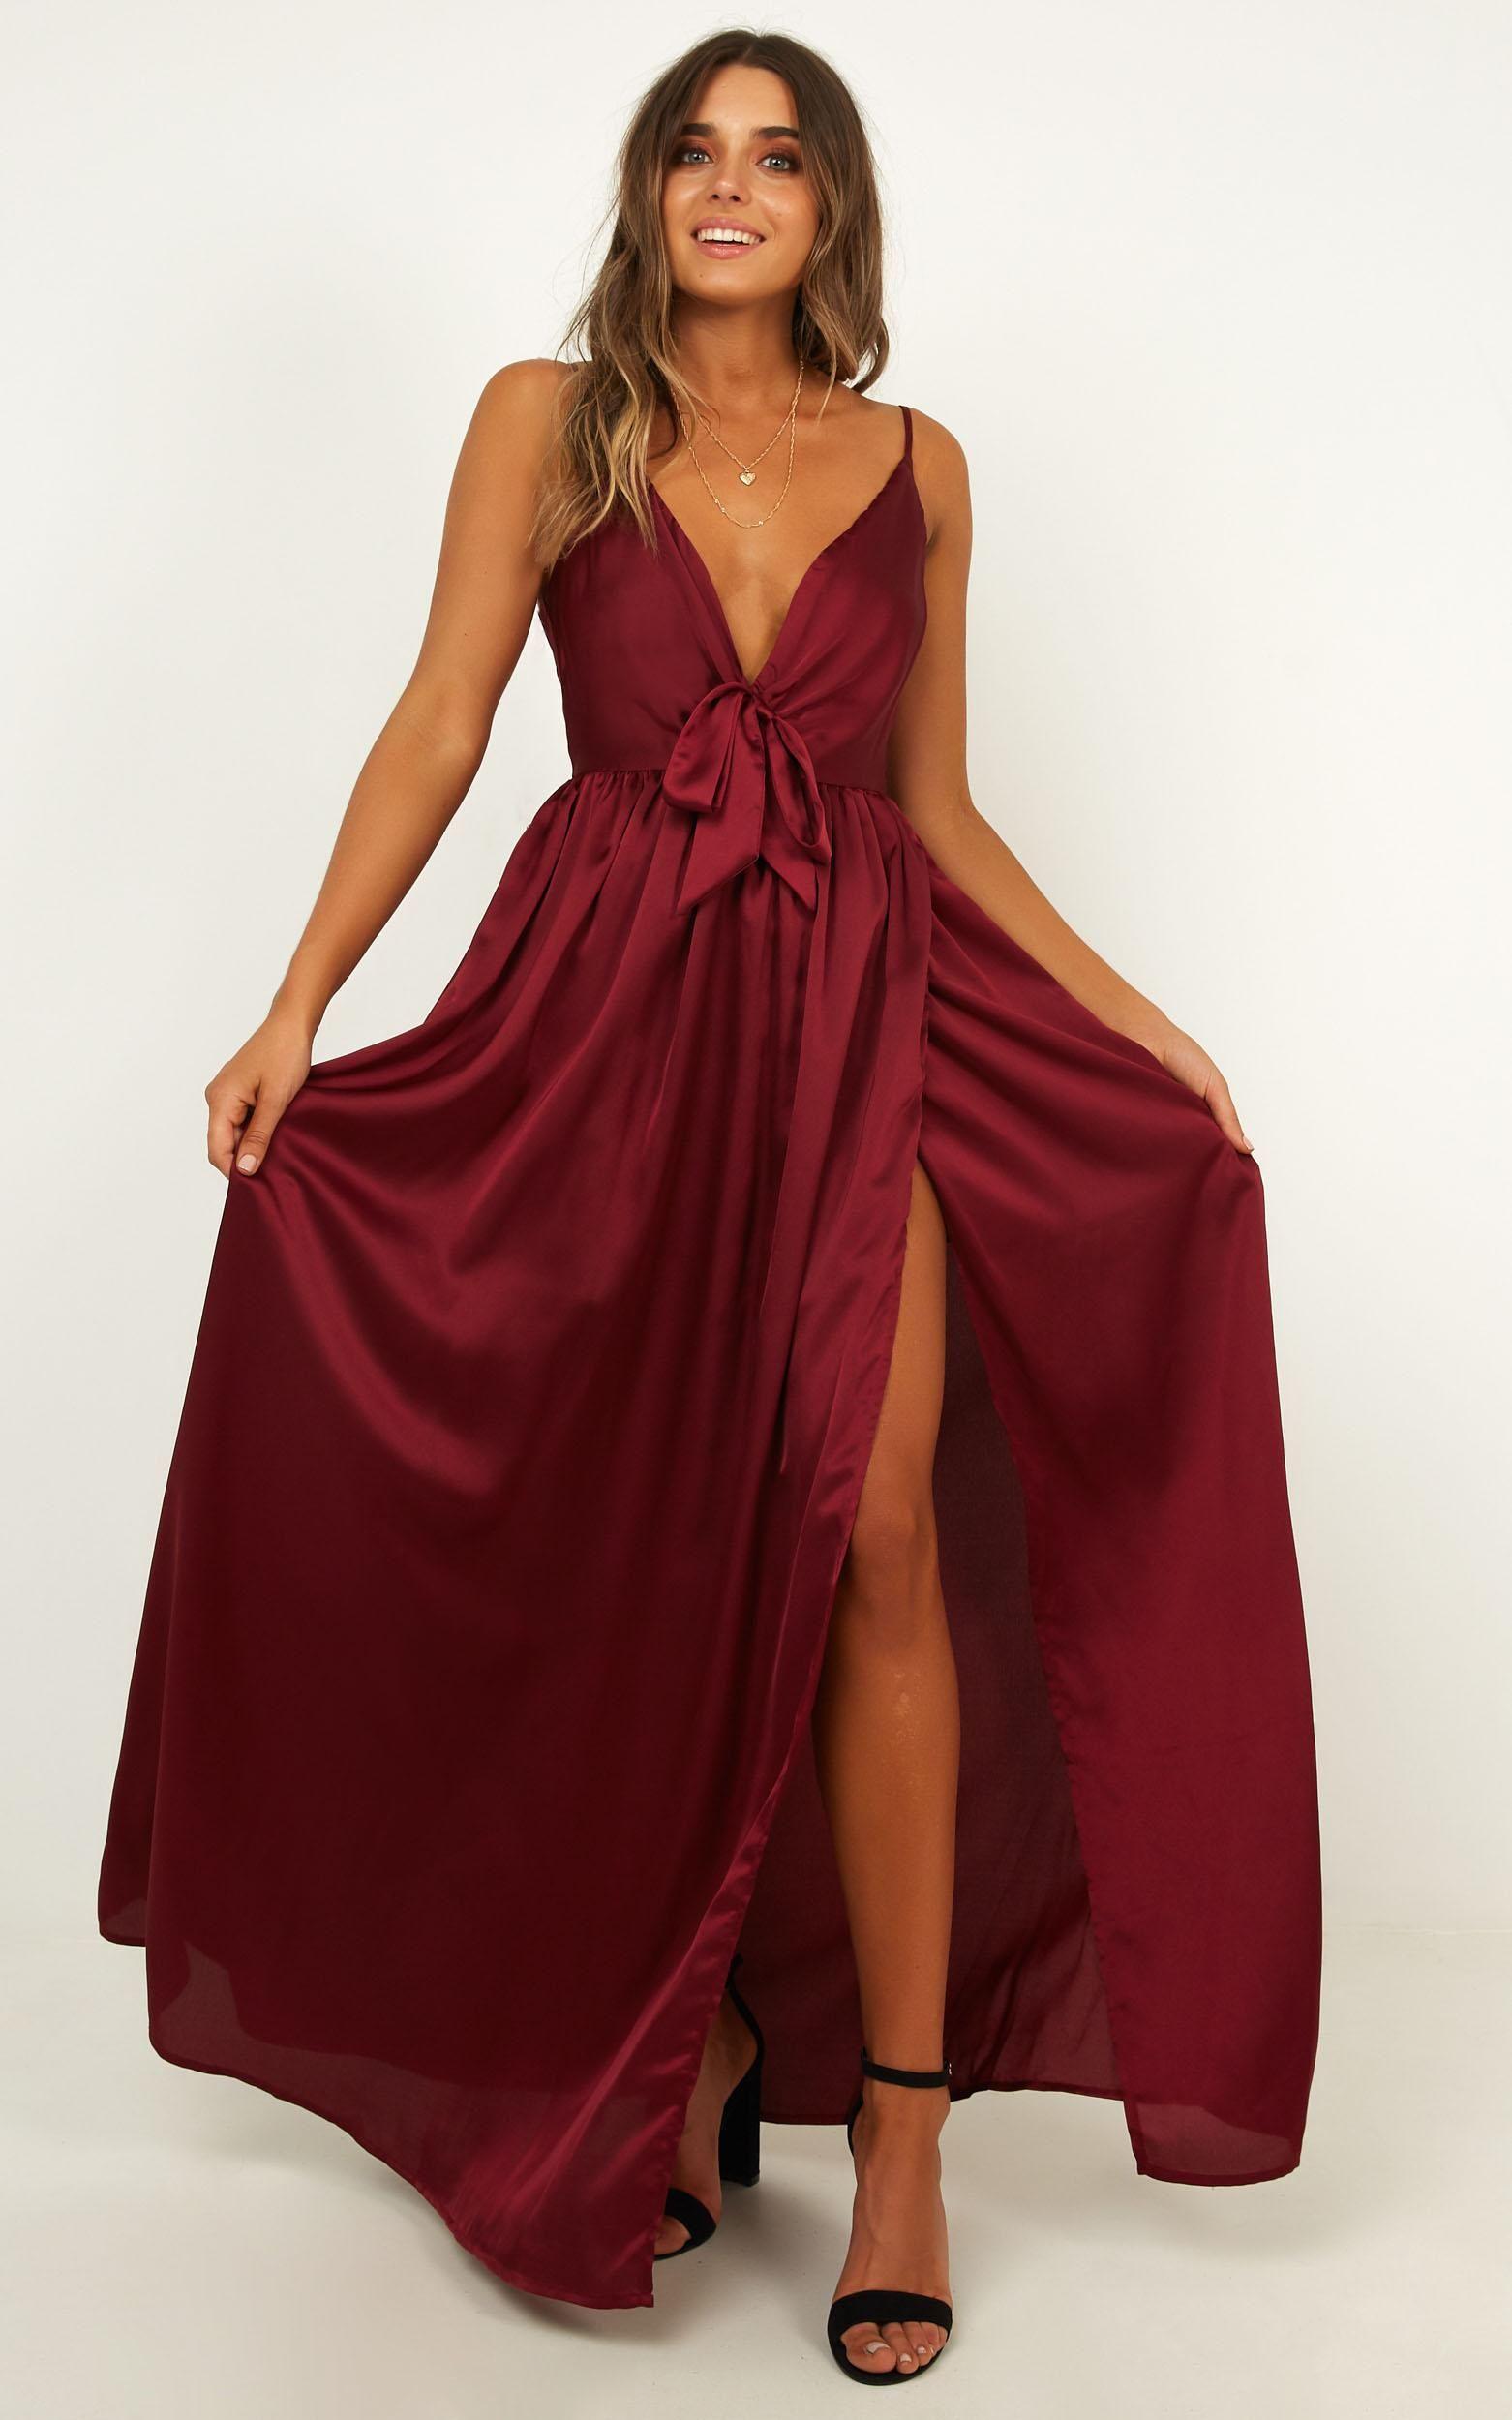 Miracle Worker Dress In Wine Satin Showpo Dresses Shop Maxi Dresses Maxi Dress [ 2500 x 1562 Pixel ]